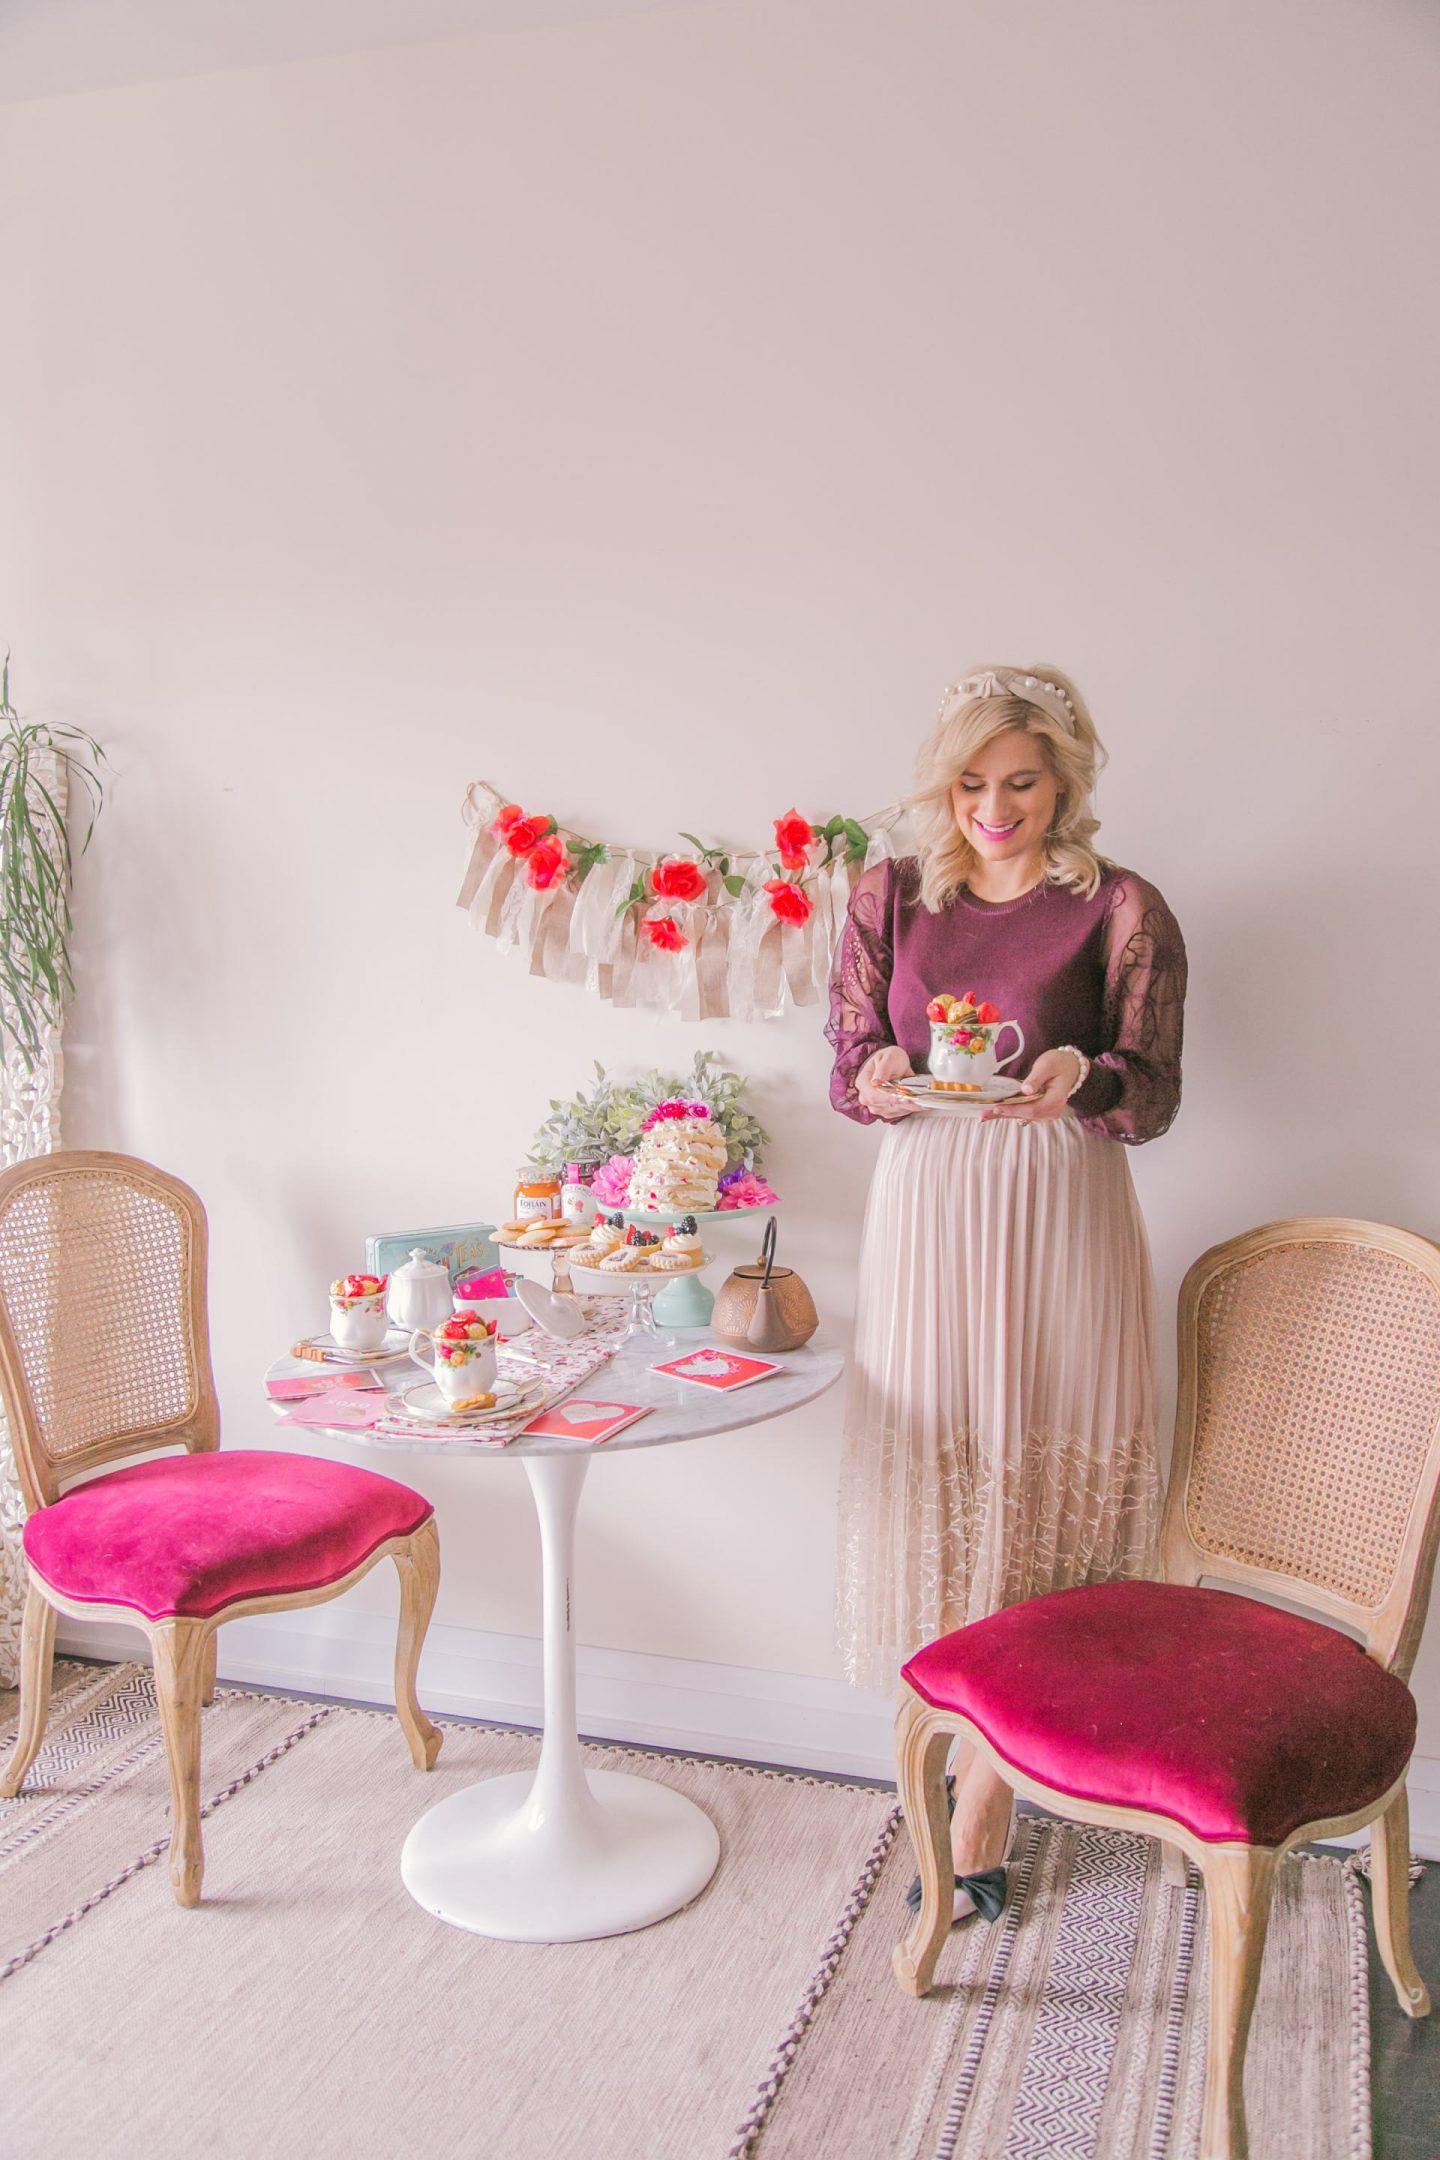 Hosting a girly Valentine's Day Afternoon Tea & Dessert Get Together